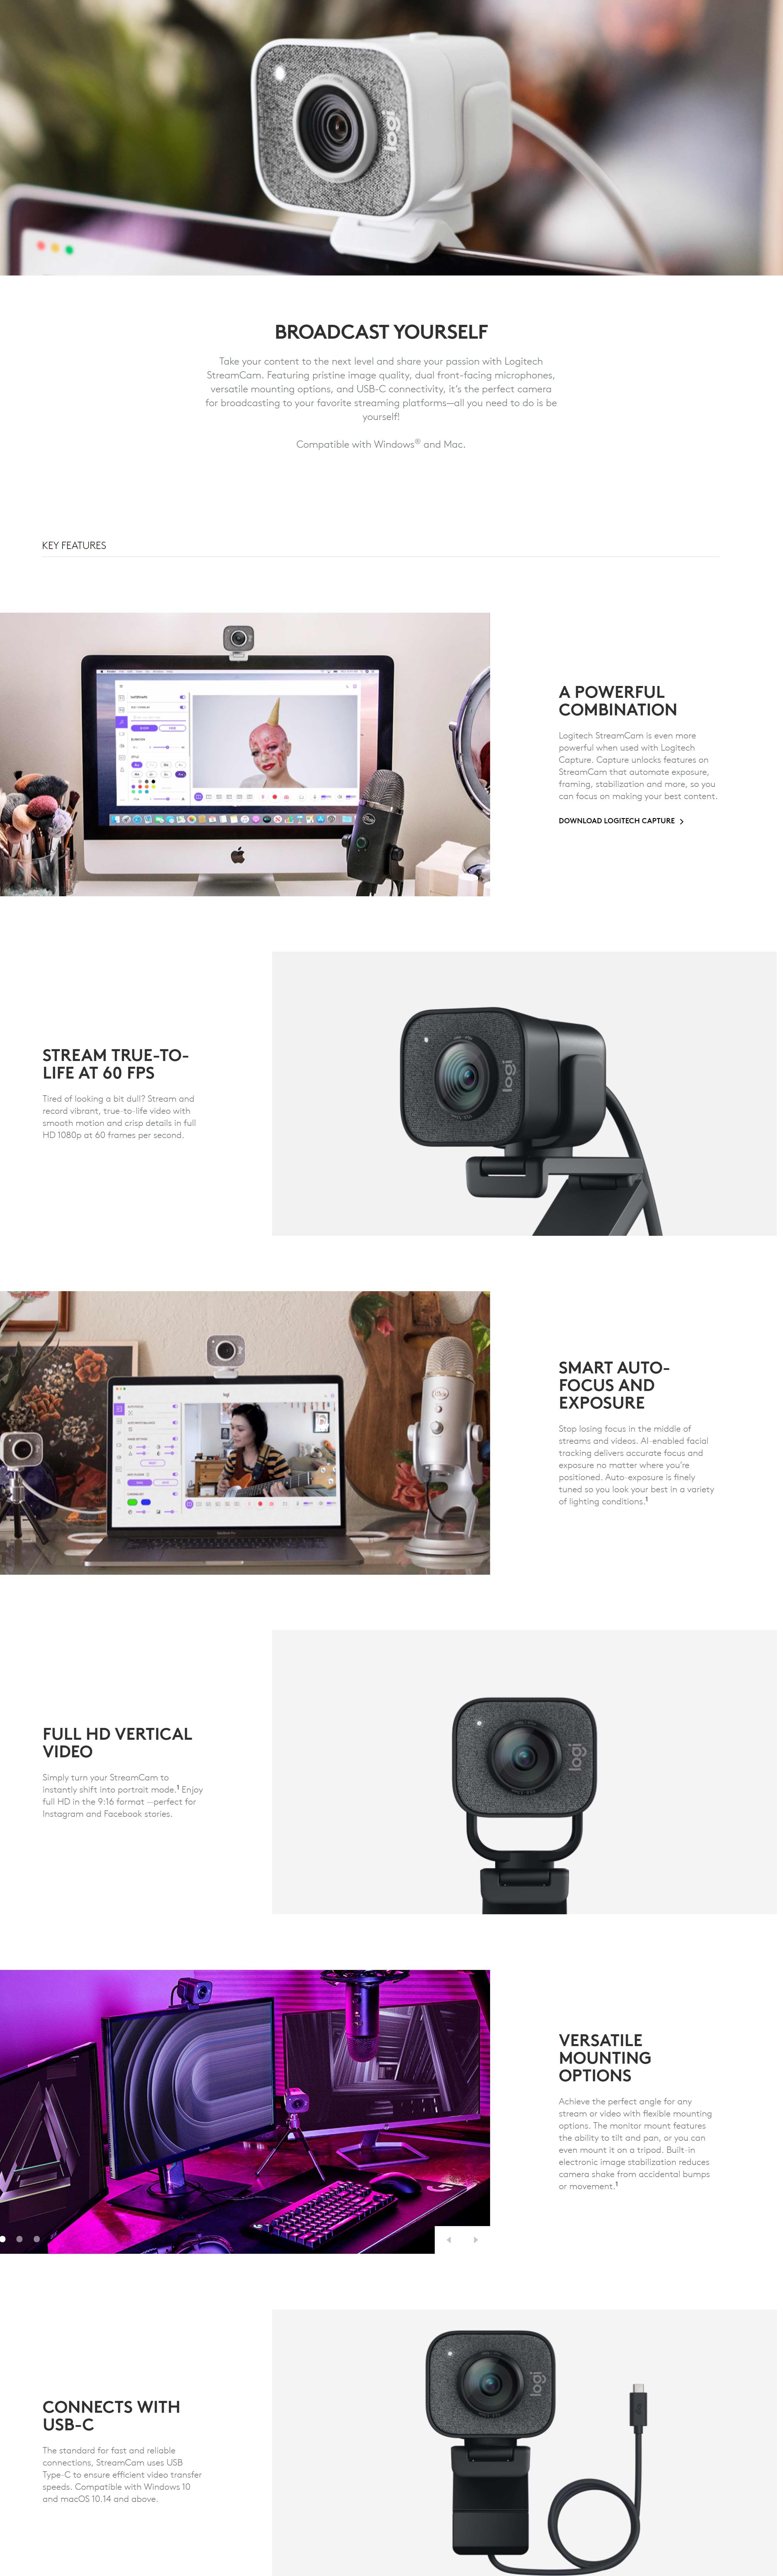 screencapture-logitech-en-au-product-streamcam-2020-07-13-16_11_19.jpg